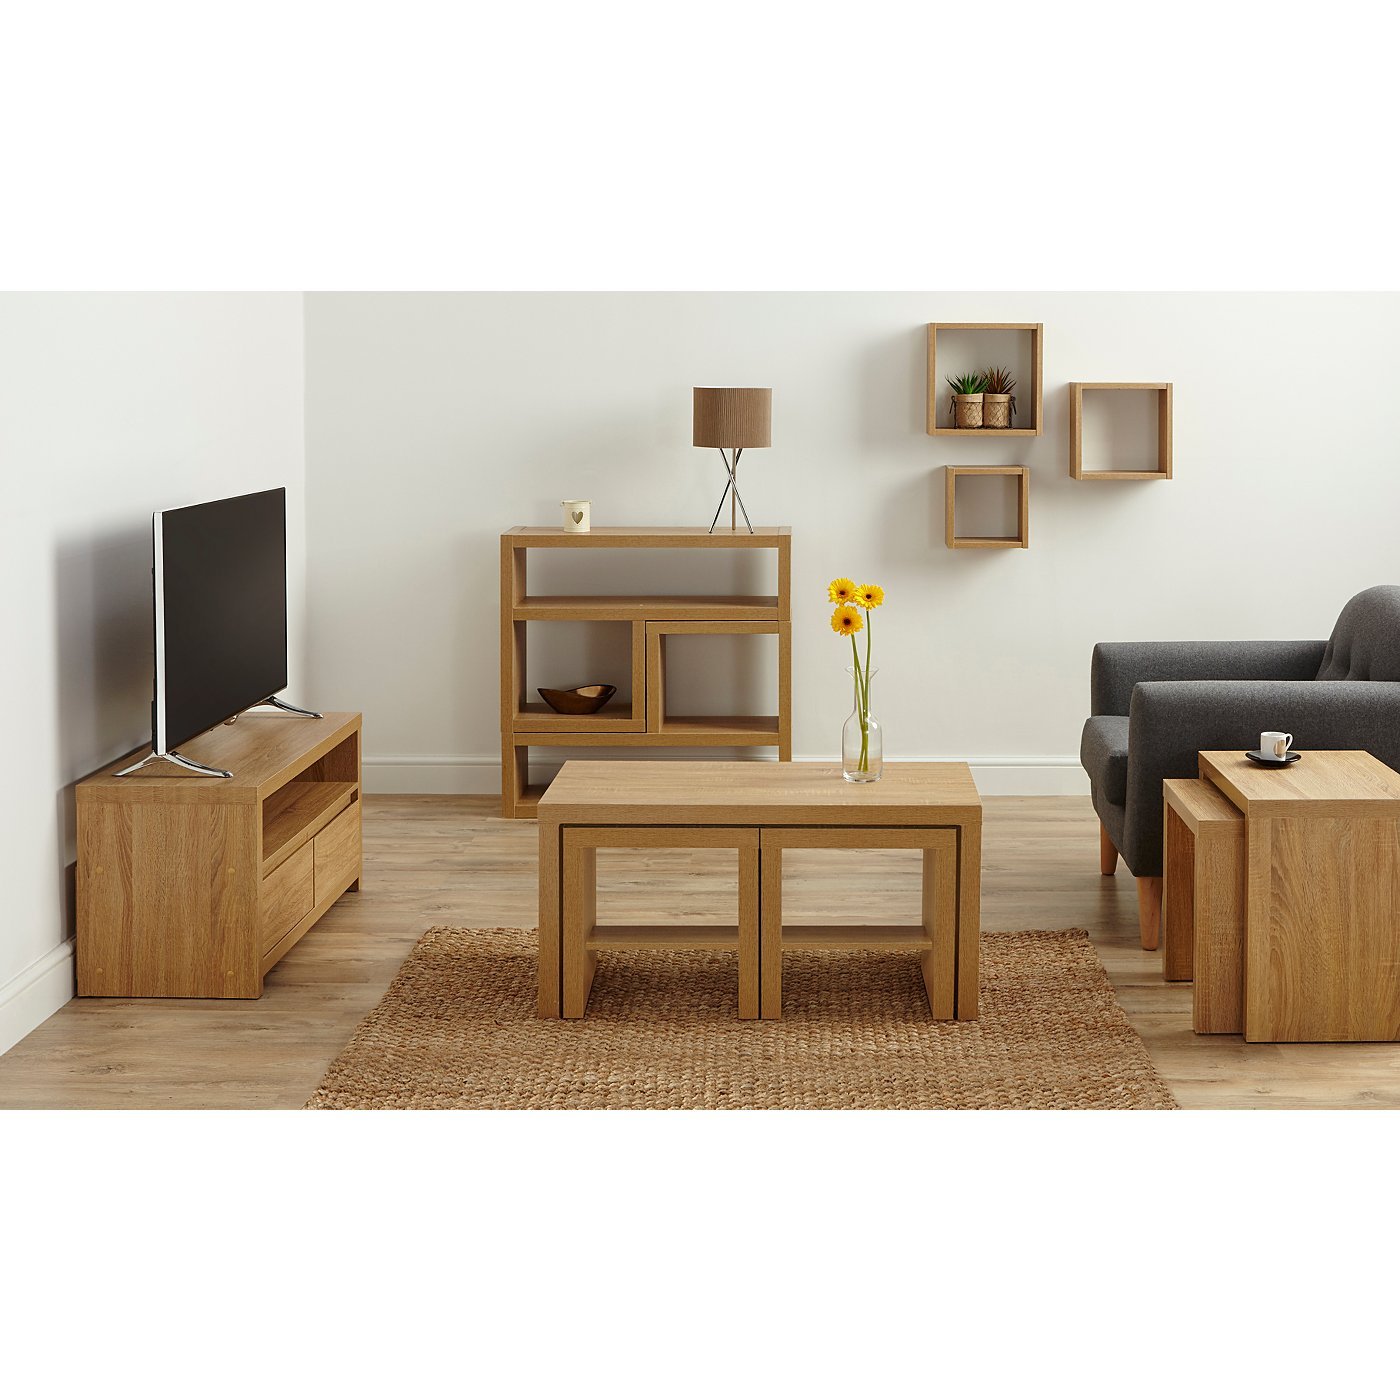 Living Room Furniture Ranges George Home Leighton Living Room Furniture Range Oak Effect